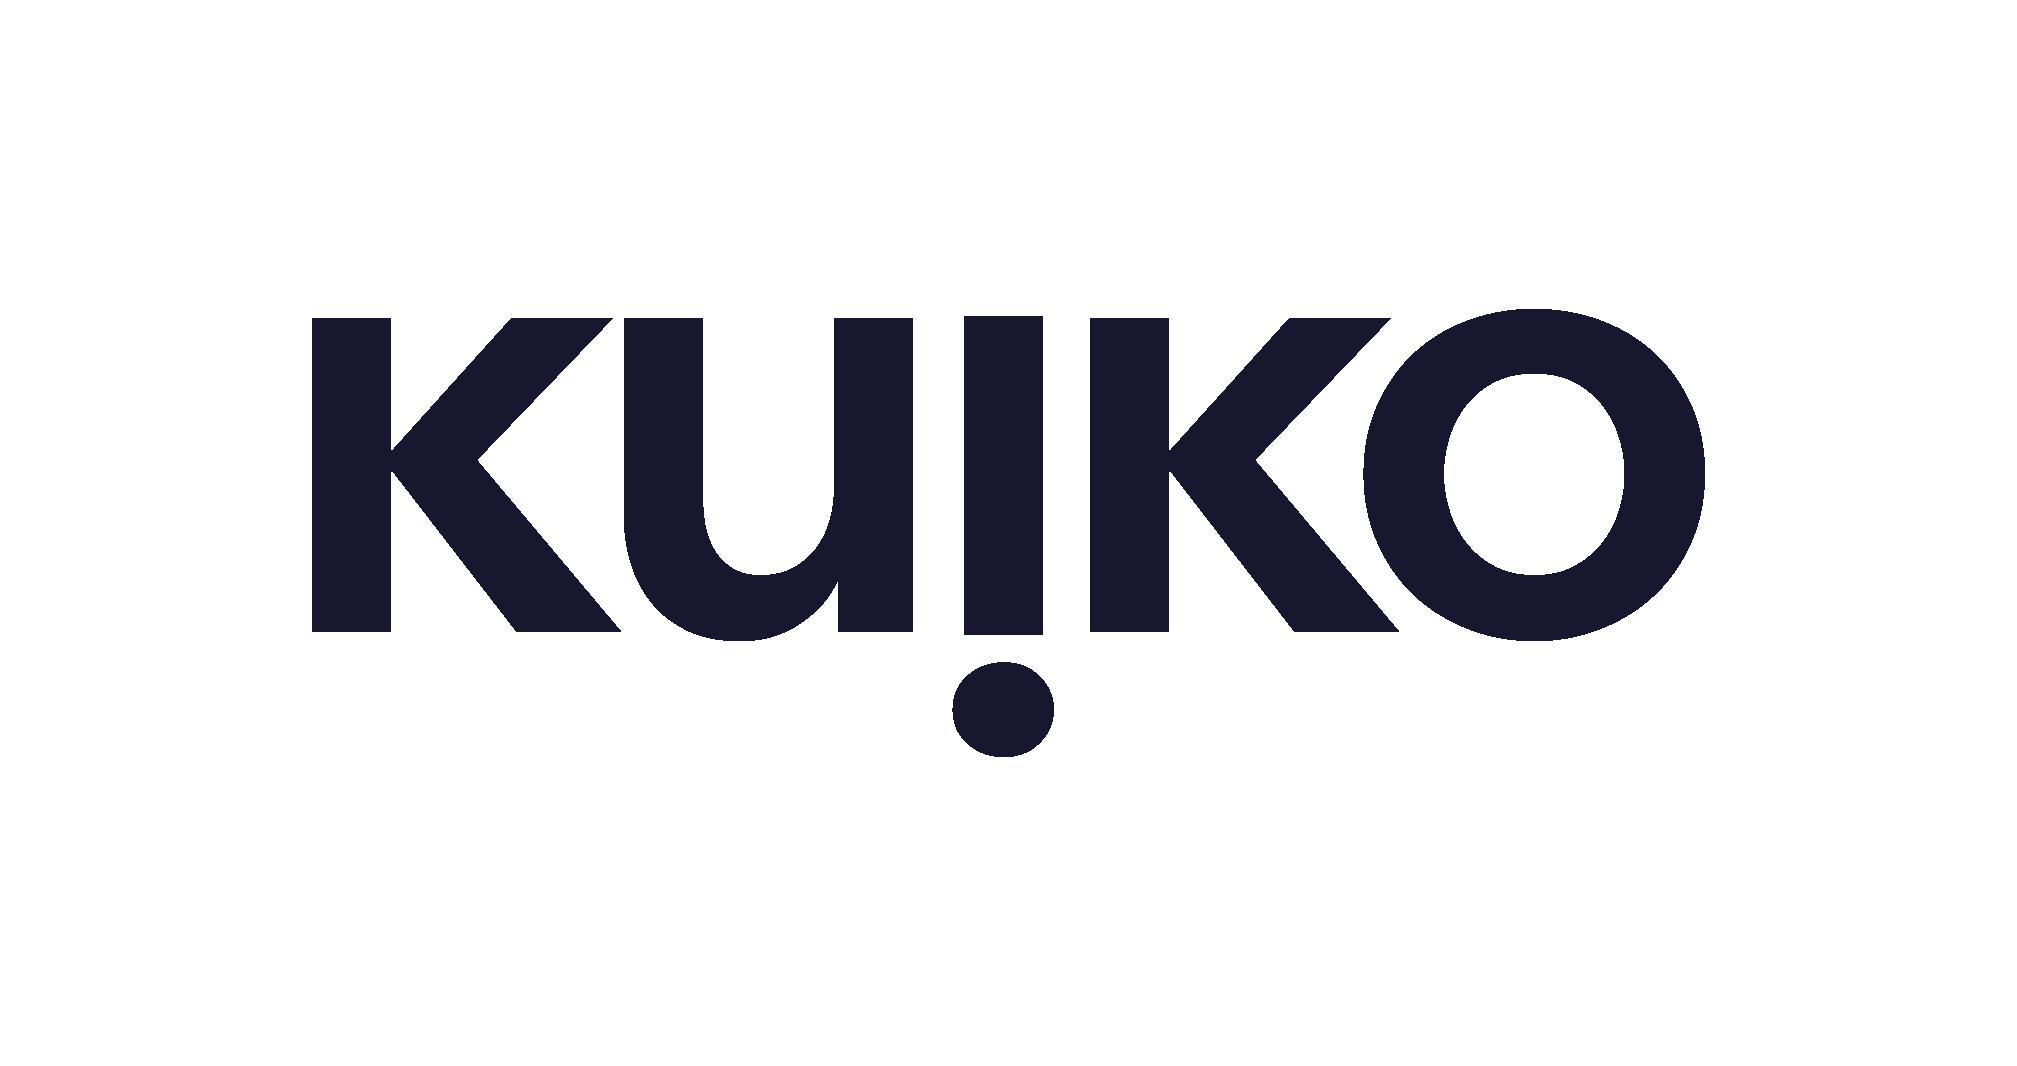 Kuiko - Ferrovial Servicios